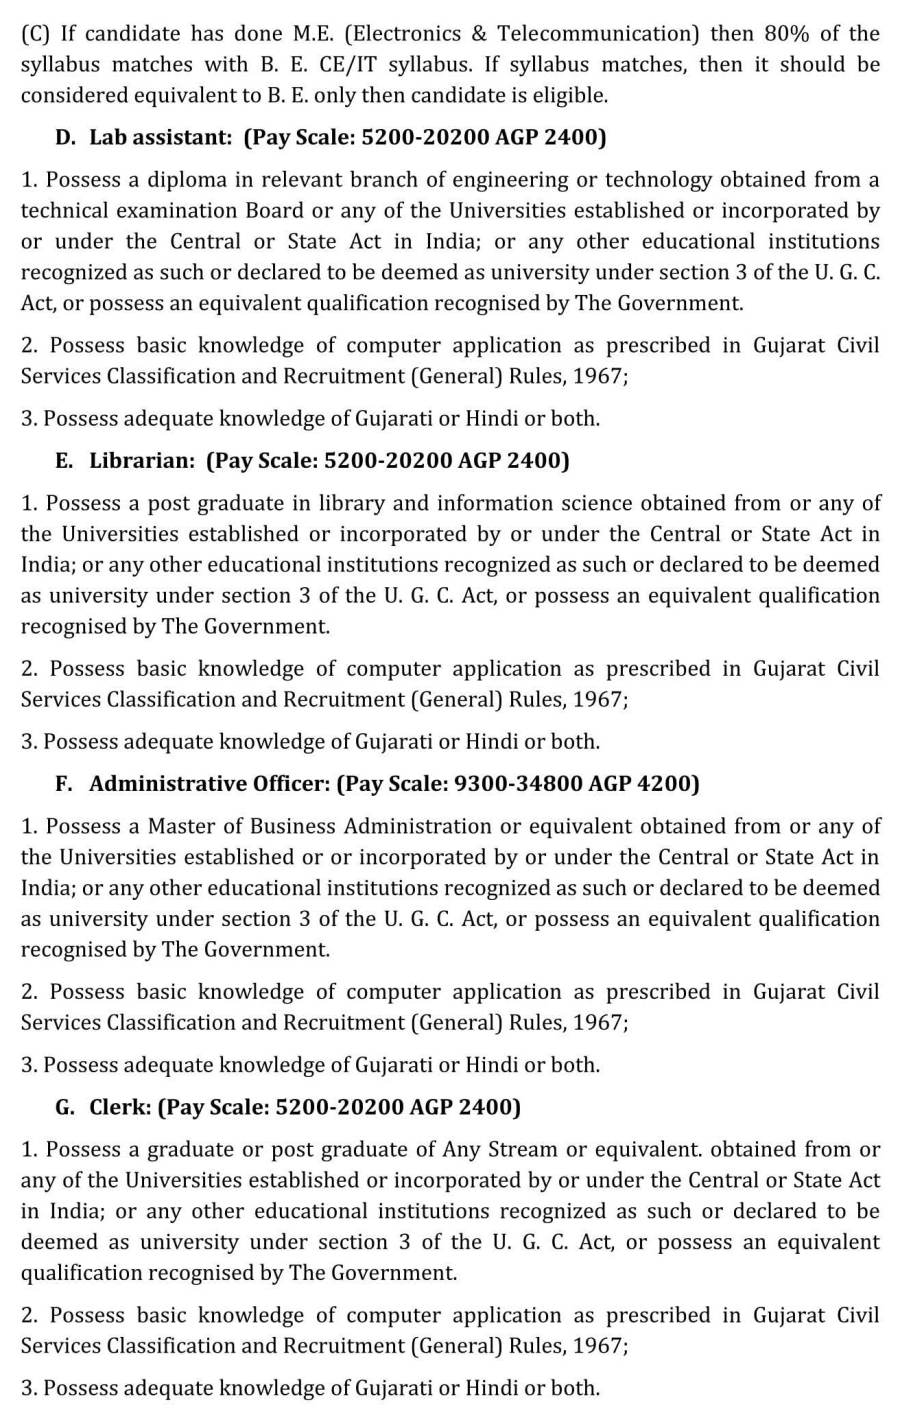 poly_rajula_recruitment_criteria-3.jpg